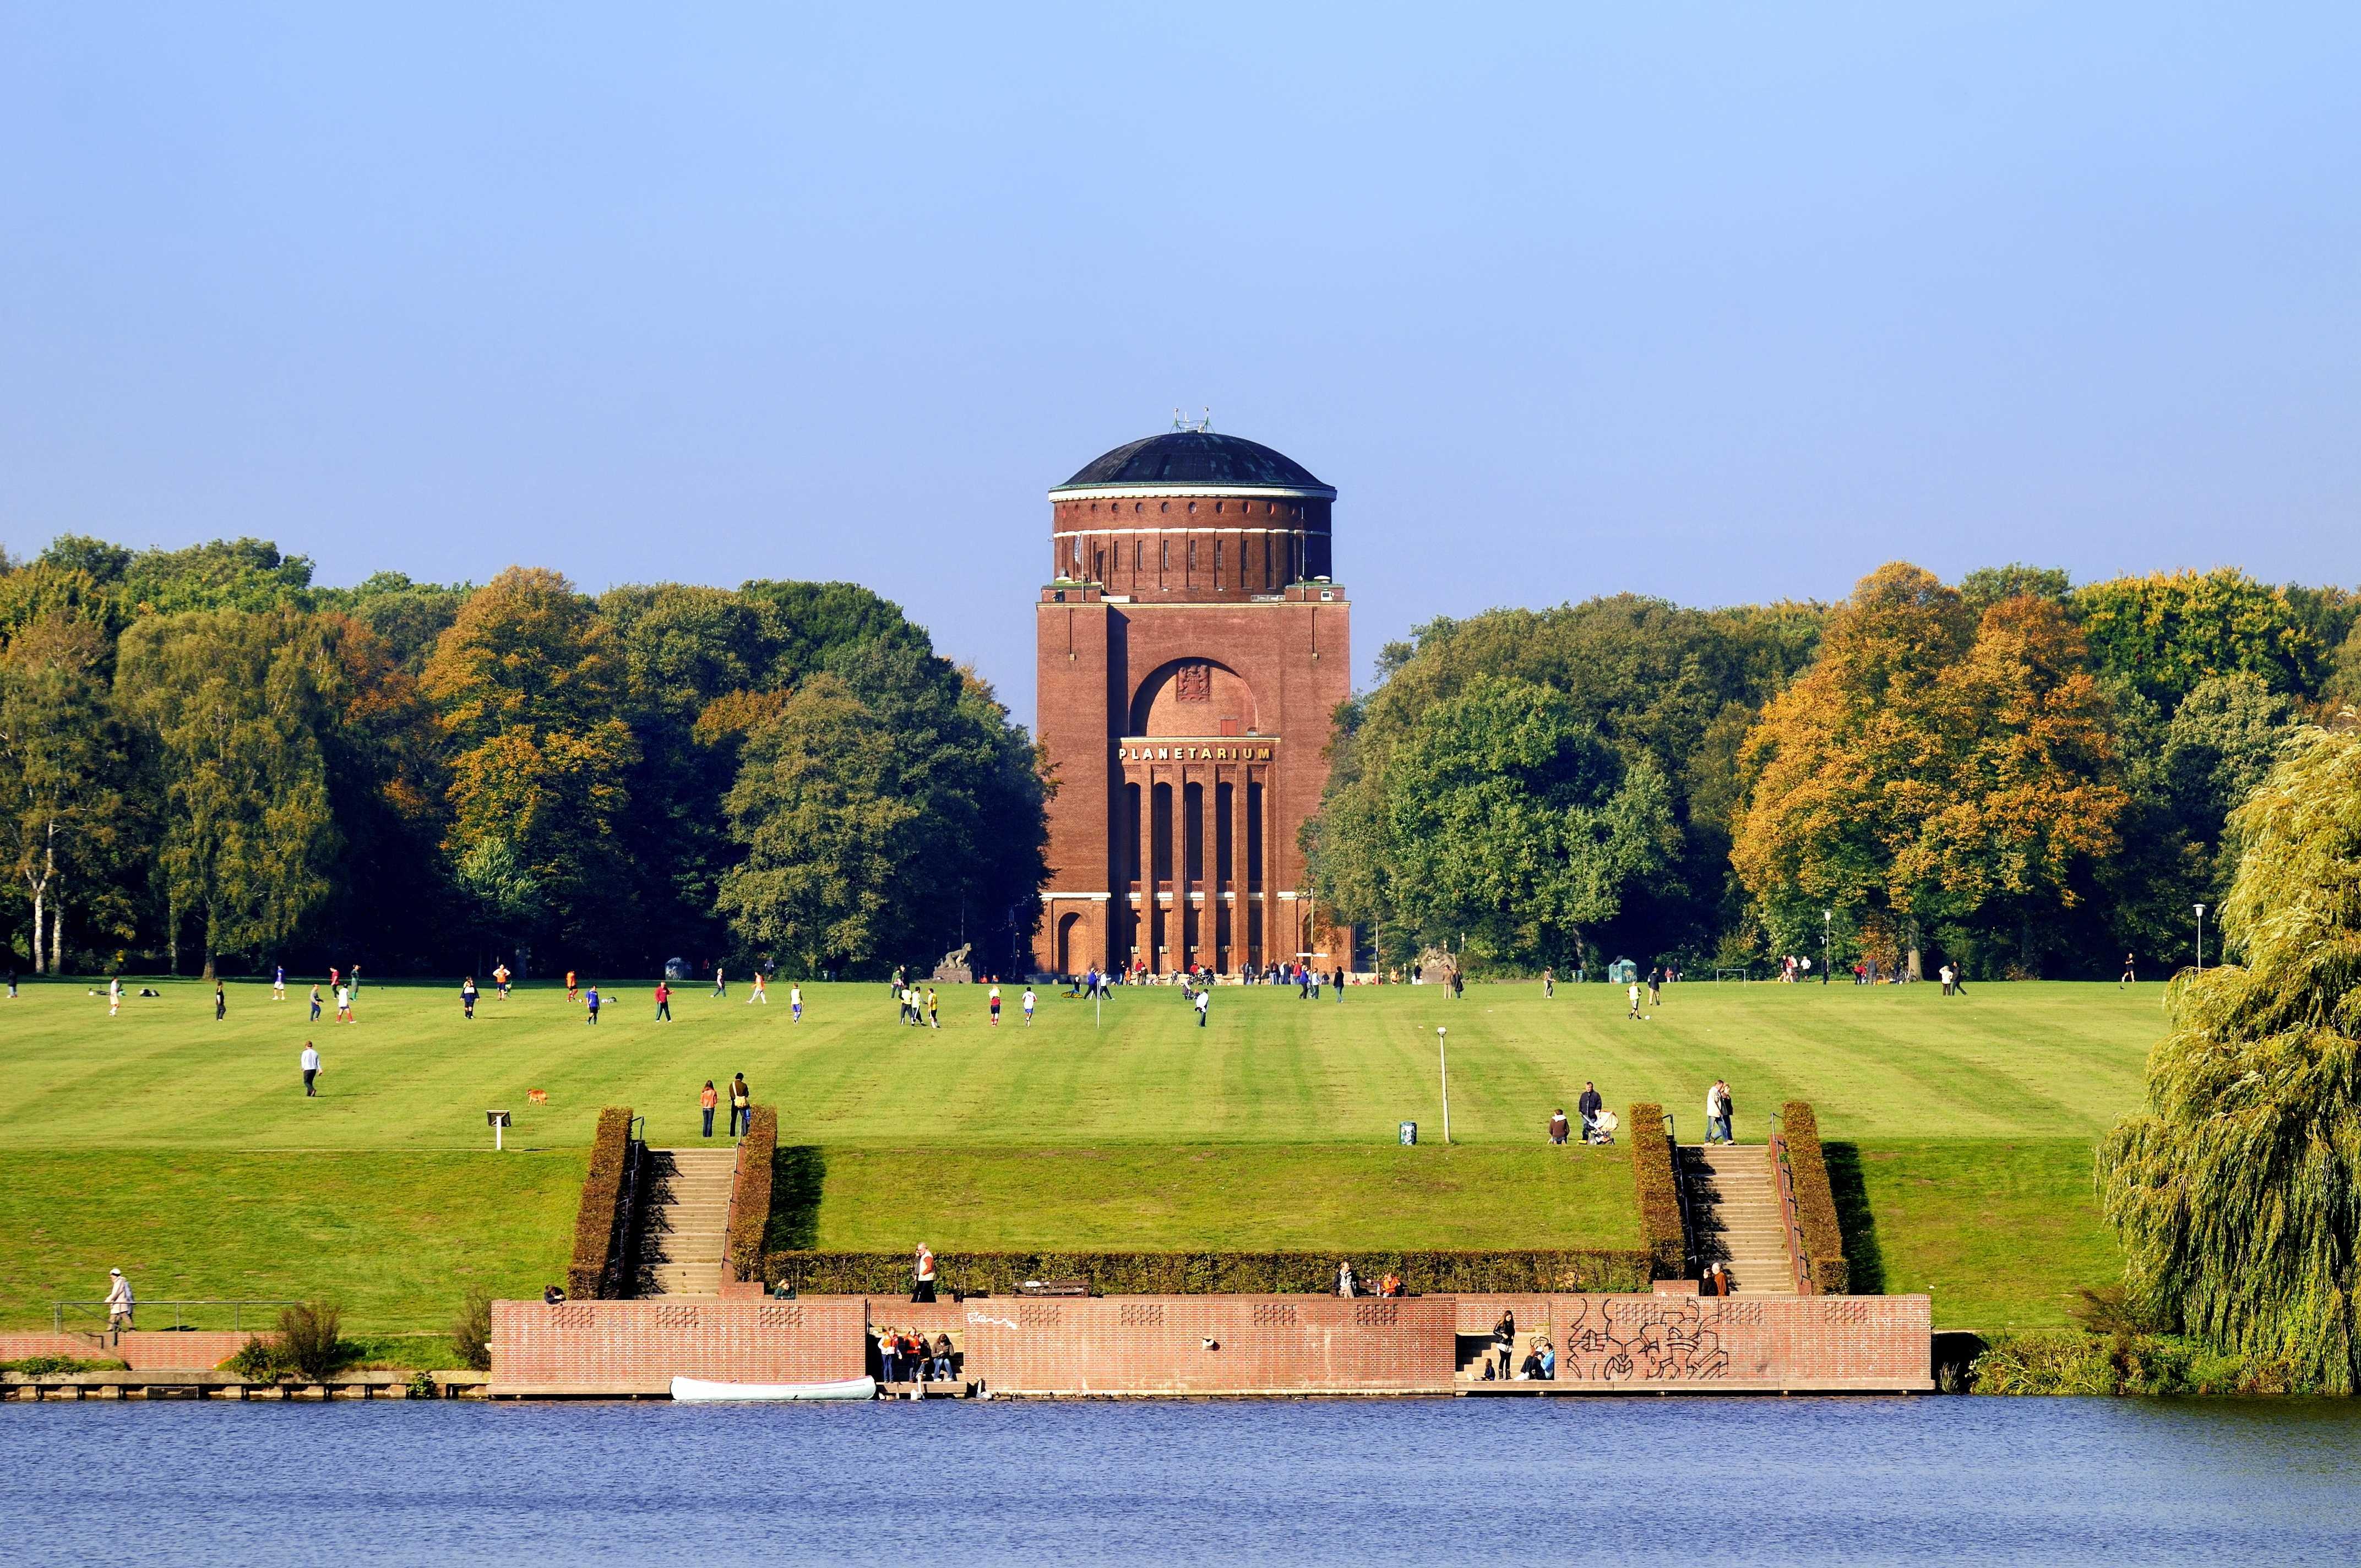 Das Planetarium im Stadtpark in Hamburg